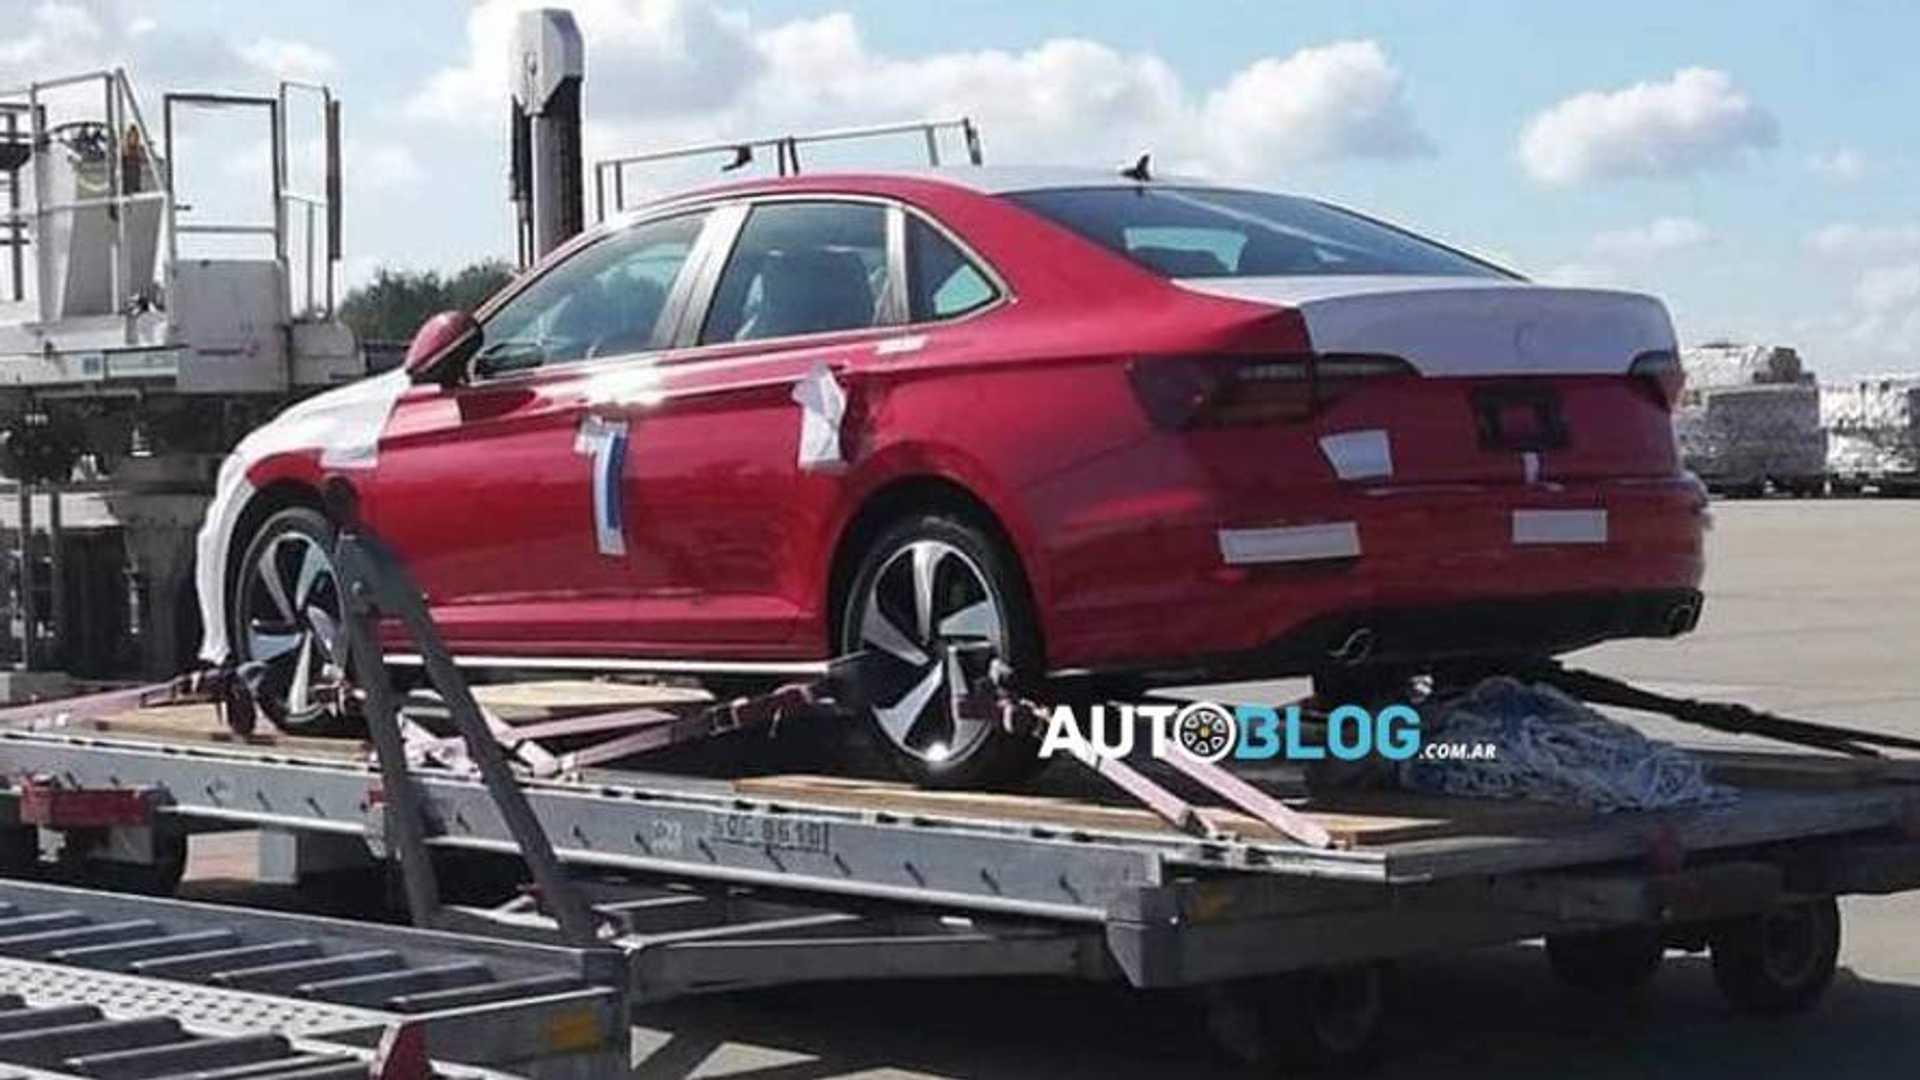 New Volkswagen Jetta Gli 2 0 Turbo Spied Getting Ready For